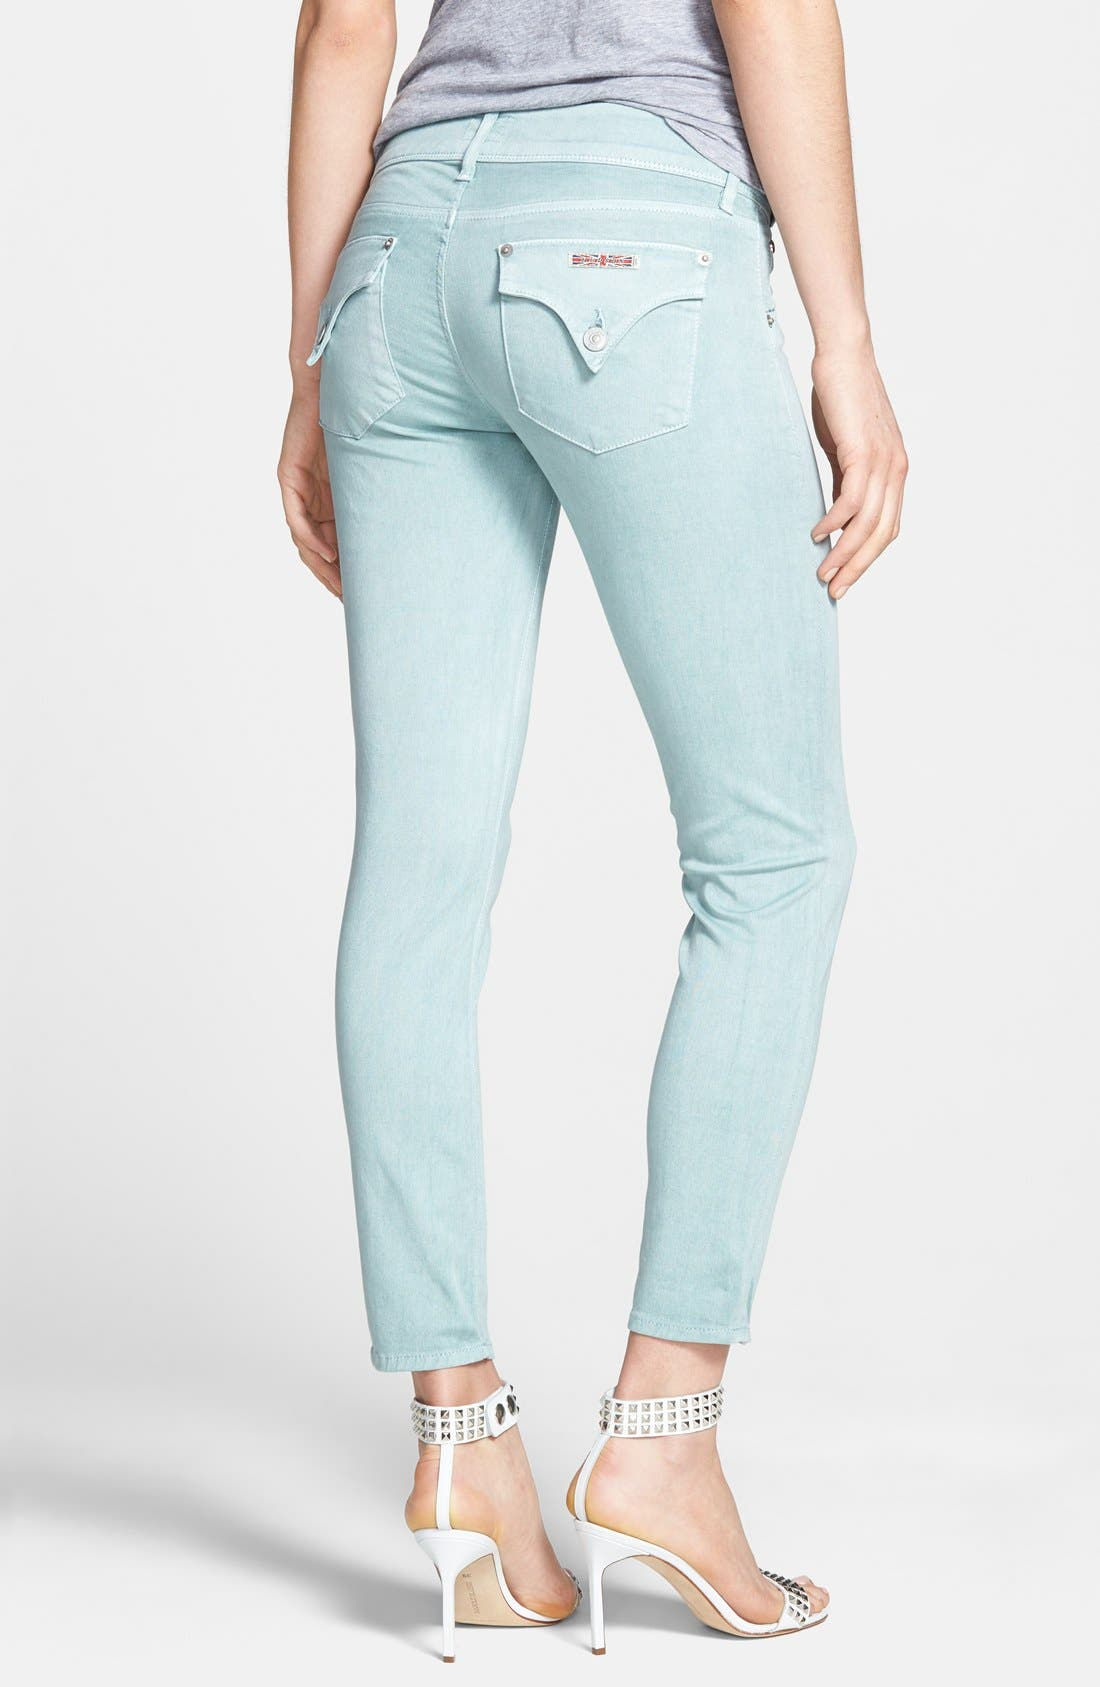 Alternate Image 2  - Hudson Jeans 'Collin' Crop Skinny Jeans (Dusty Pistachio)